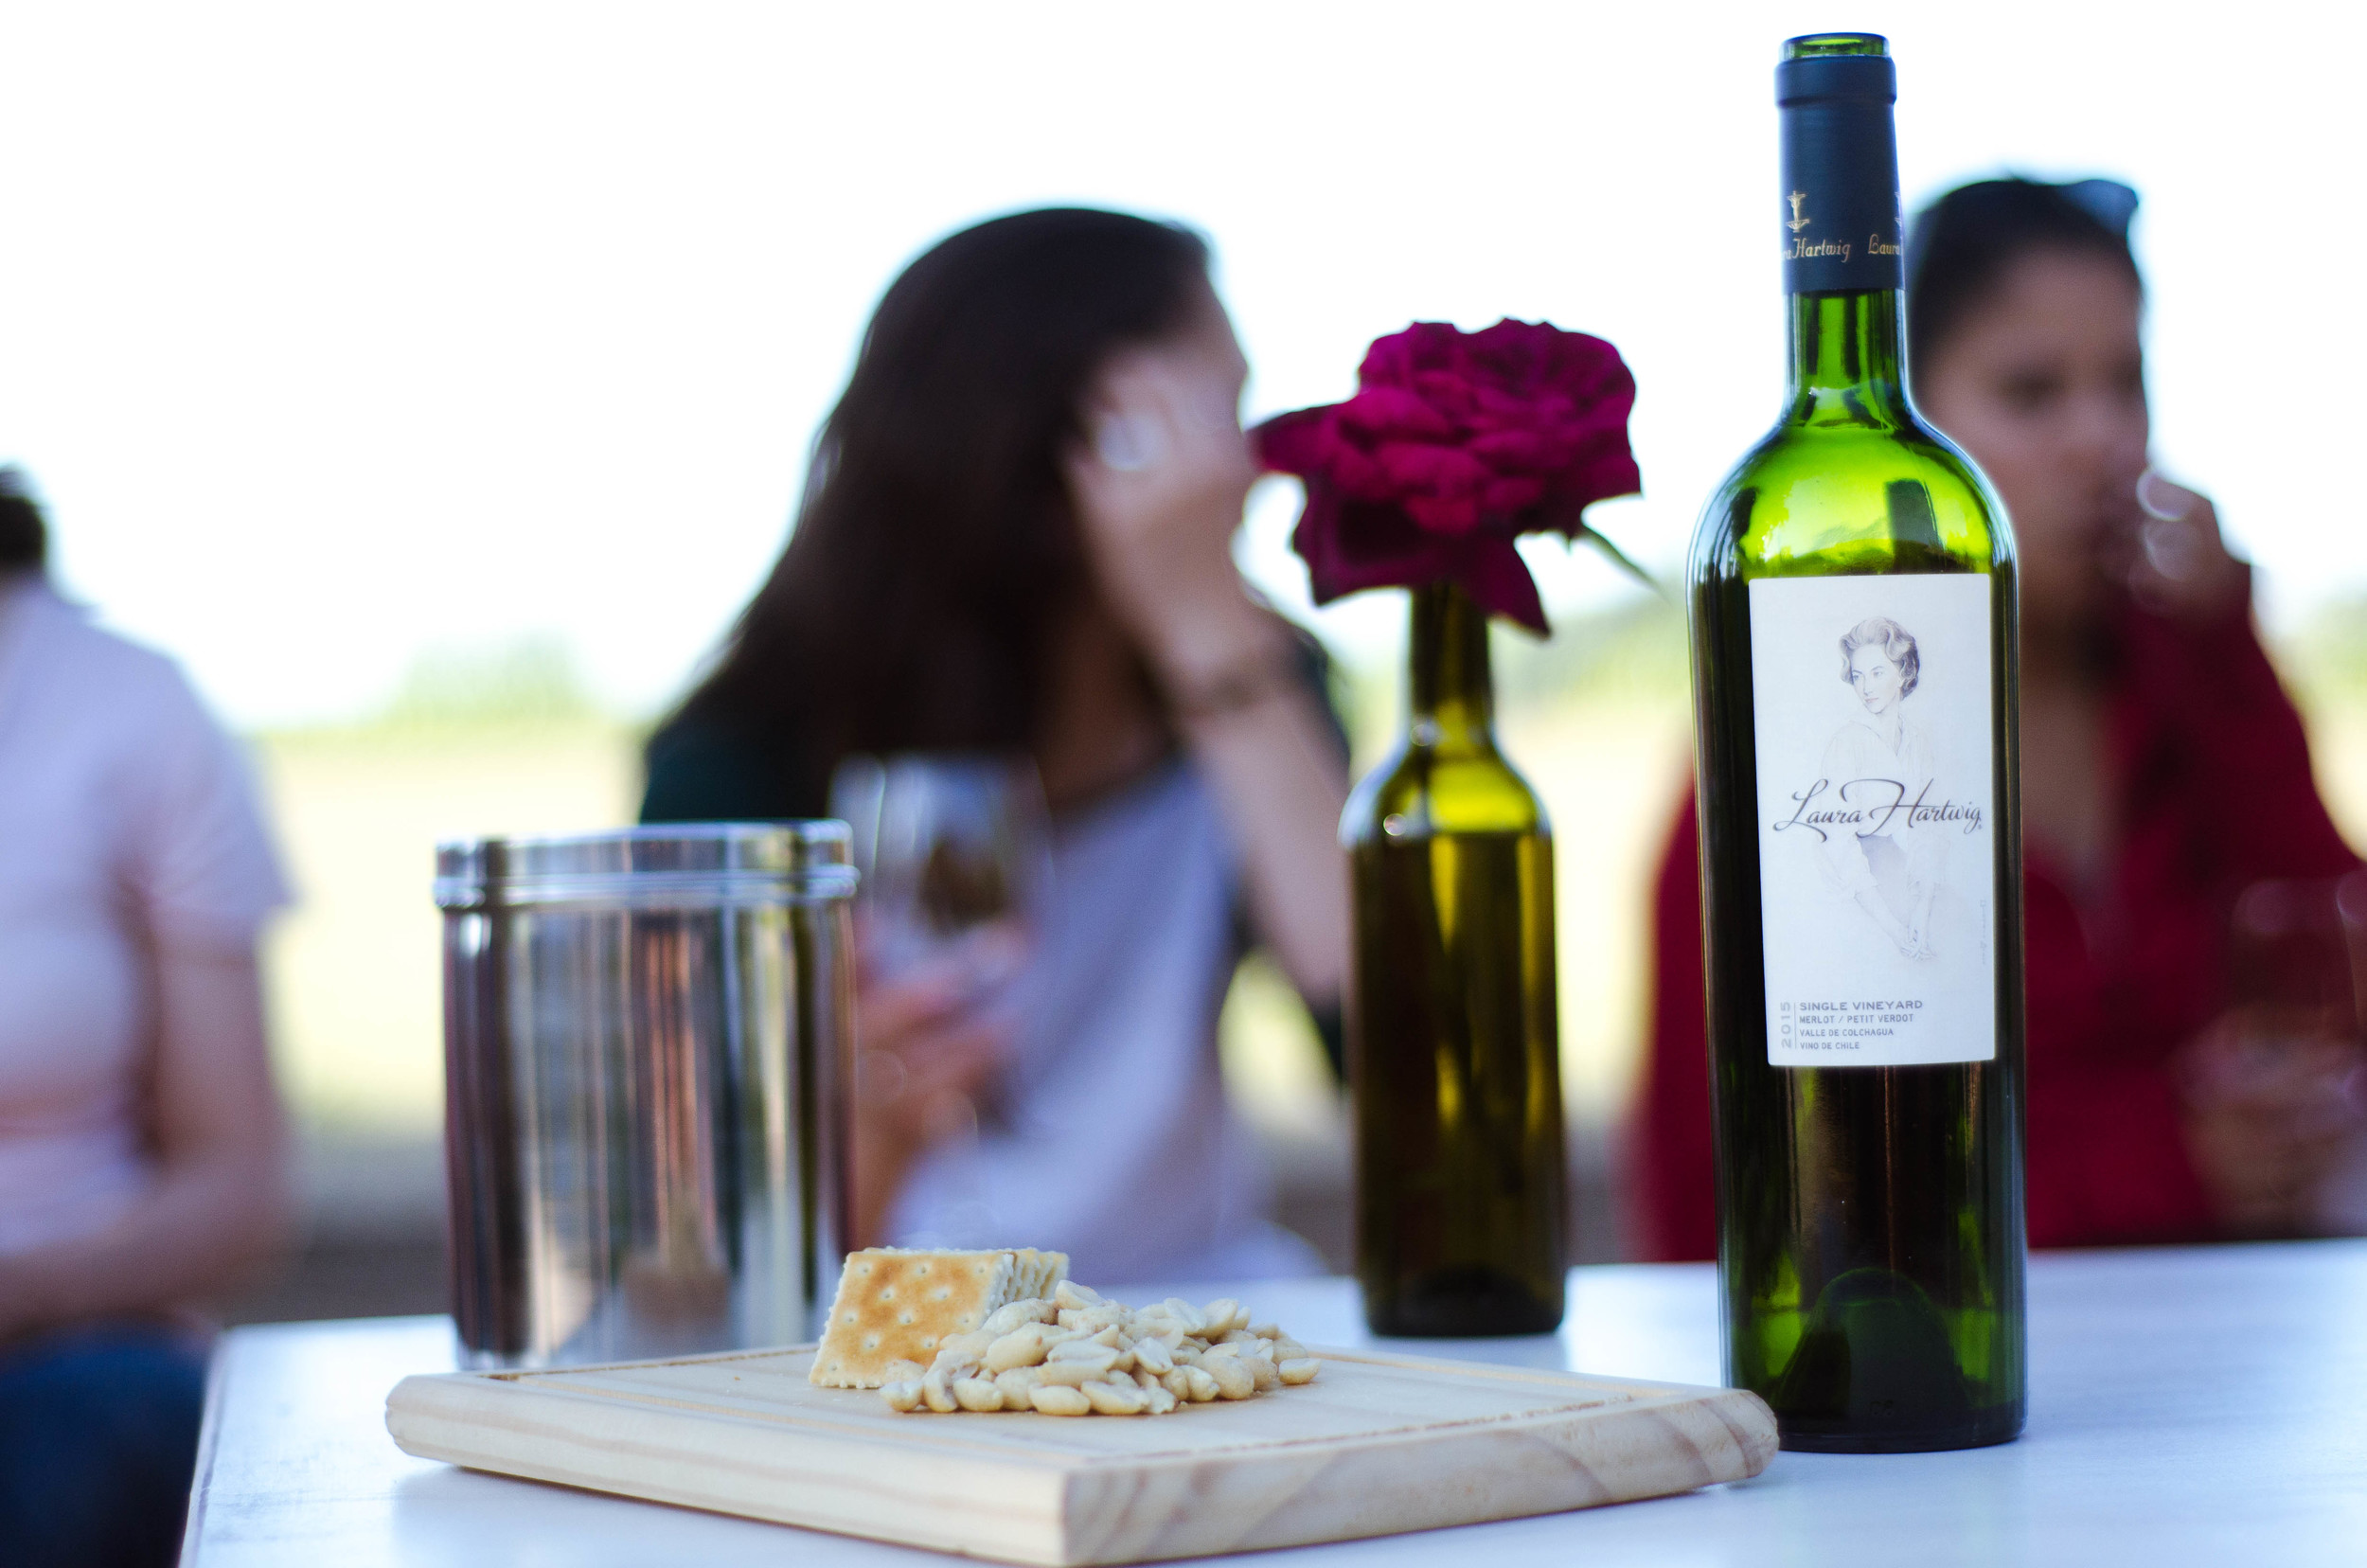 Wine tasting at Laura Hartwig vineyard // 27 november